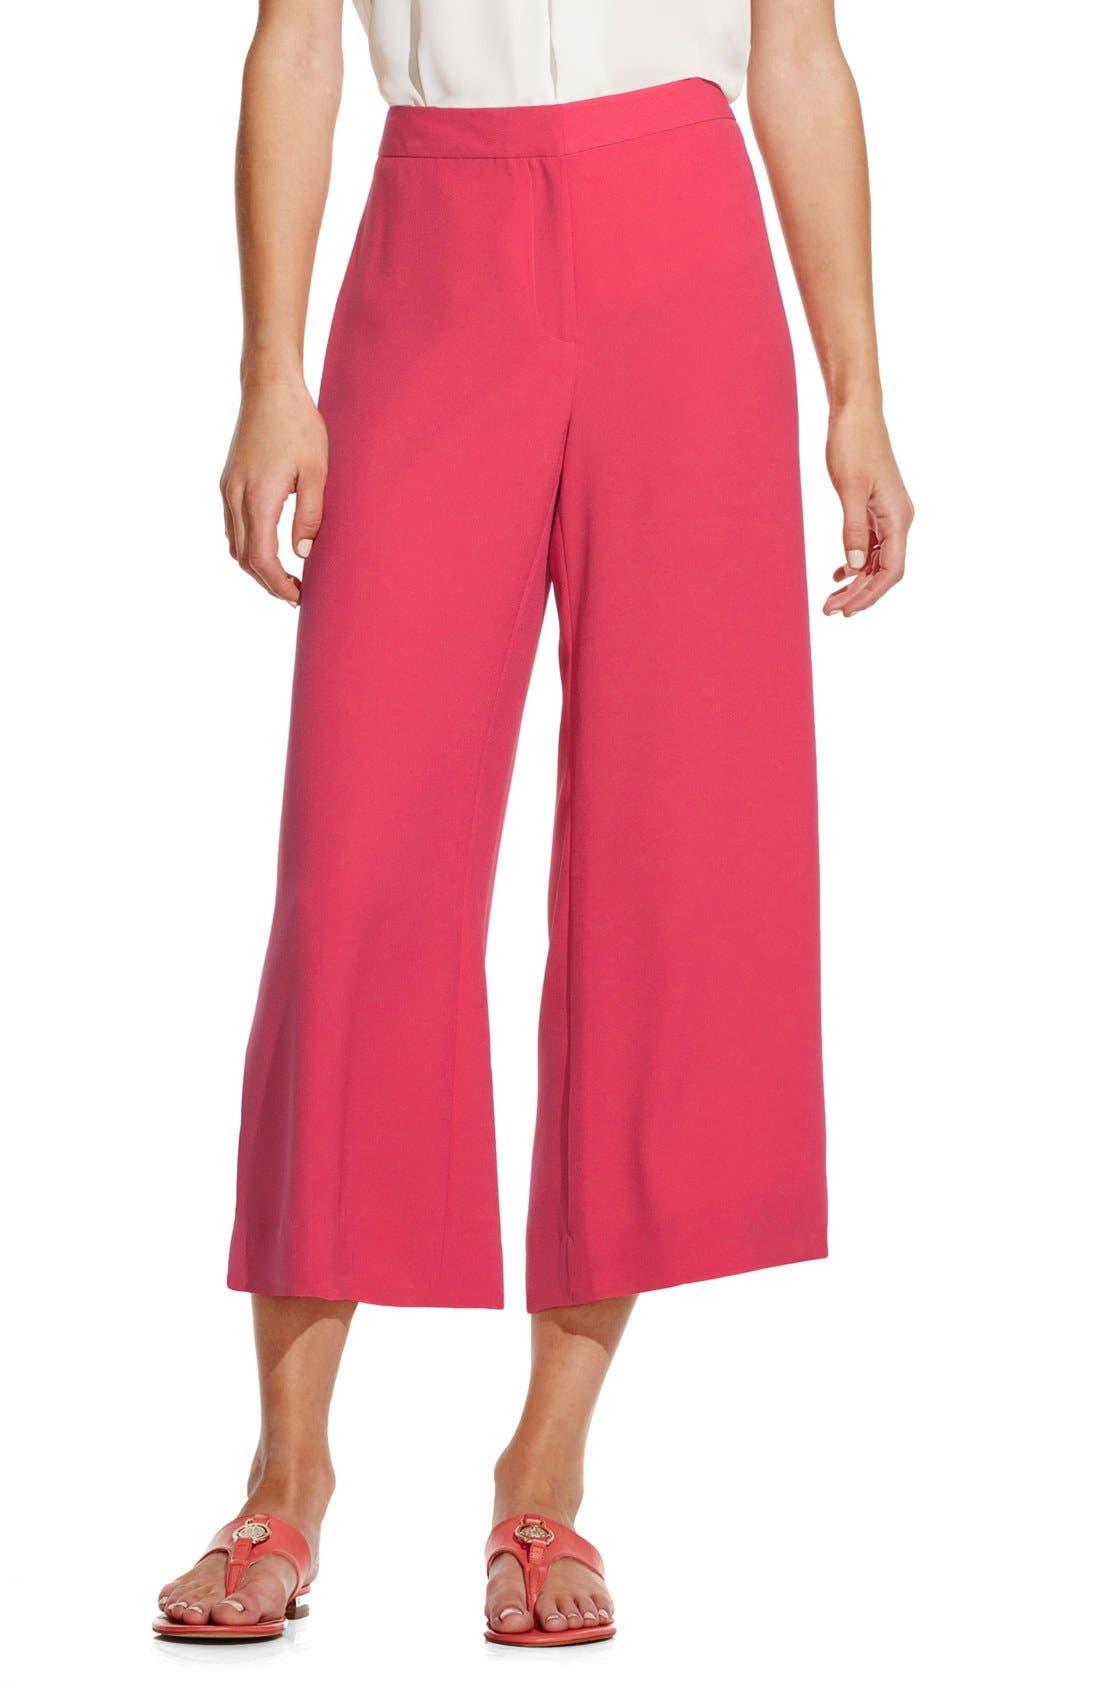 VINCE CAMUTO Zip Front Culottes, Main, color, 630